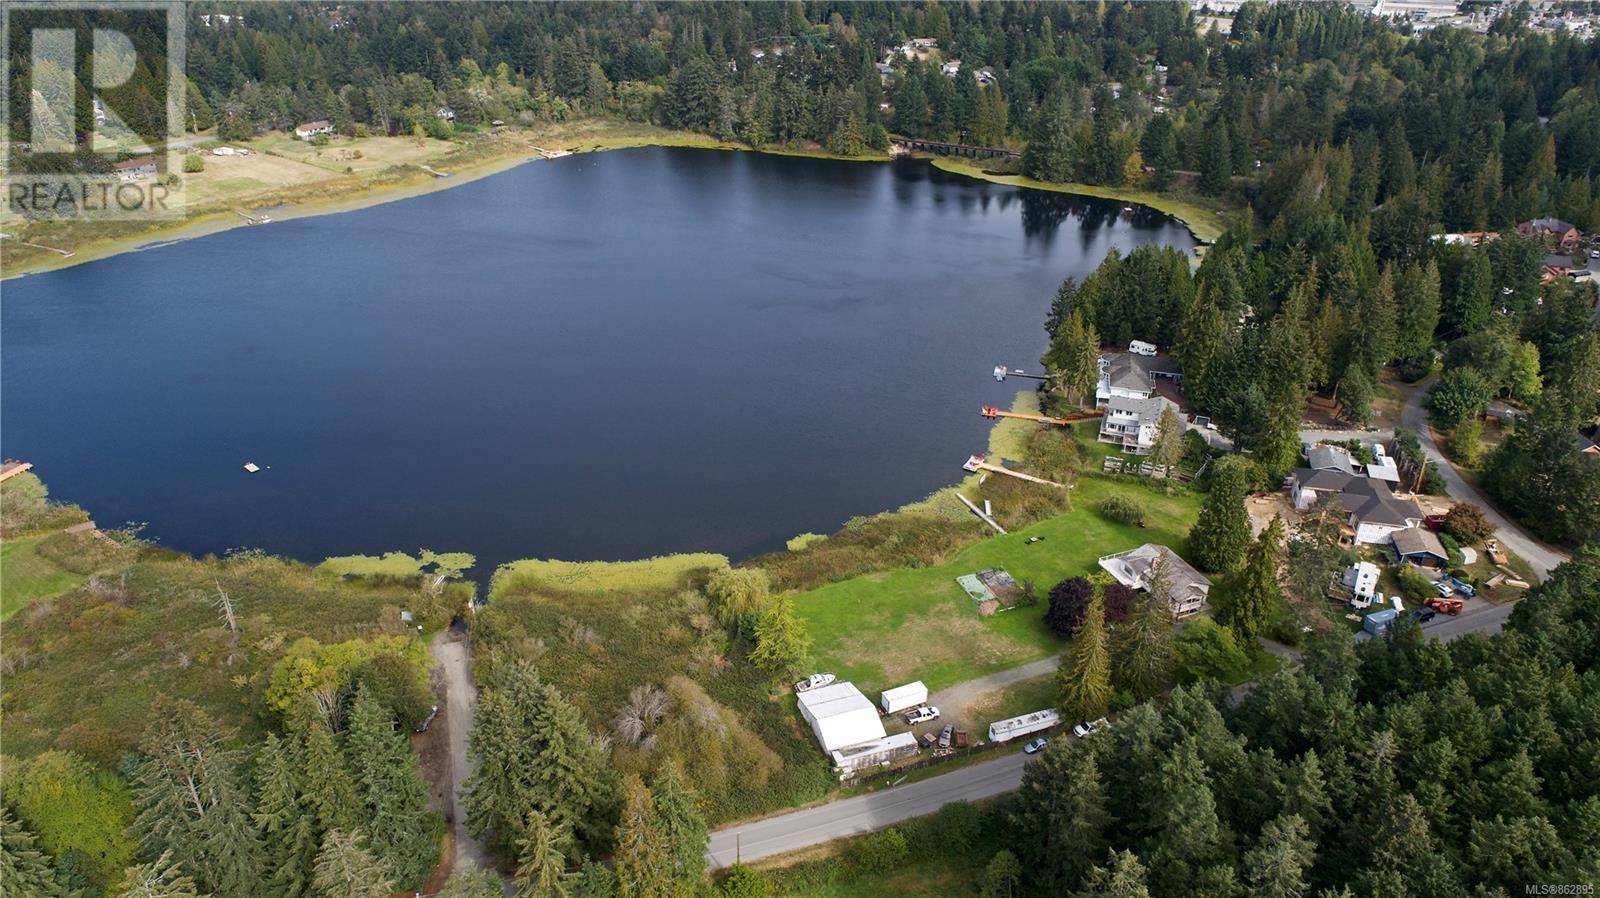 6690 Jenkins Rd, Nanaimo, British Columbia  V9T 6G8 - Photo 33 - 862895